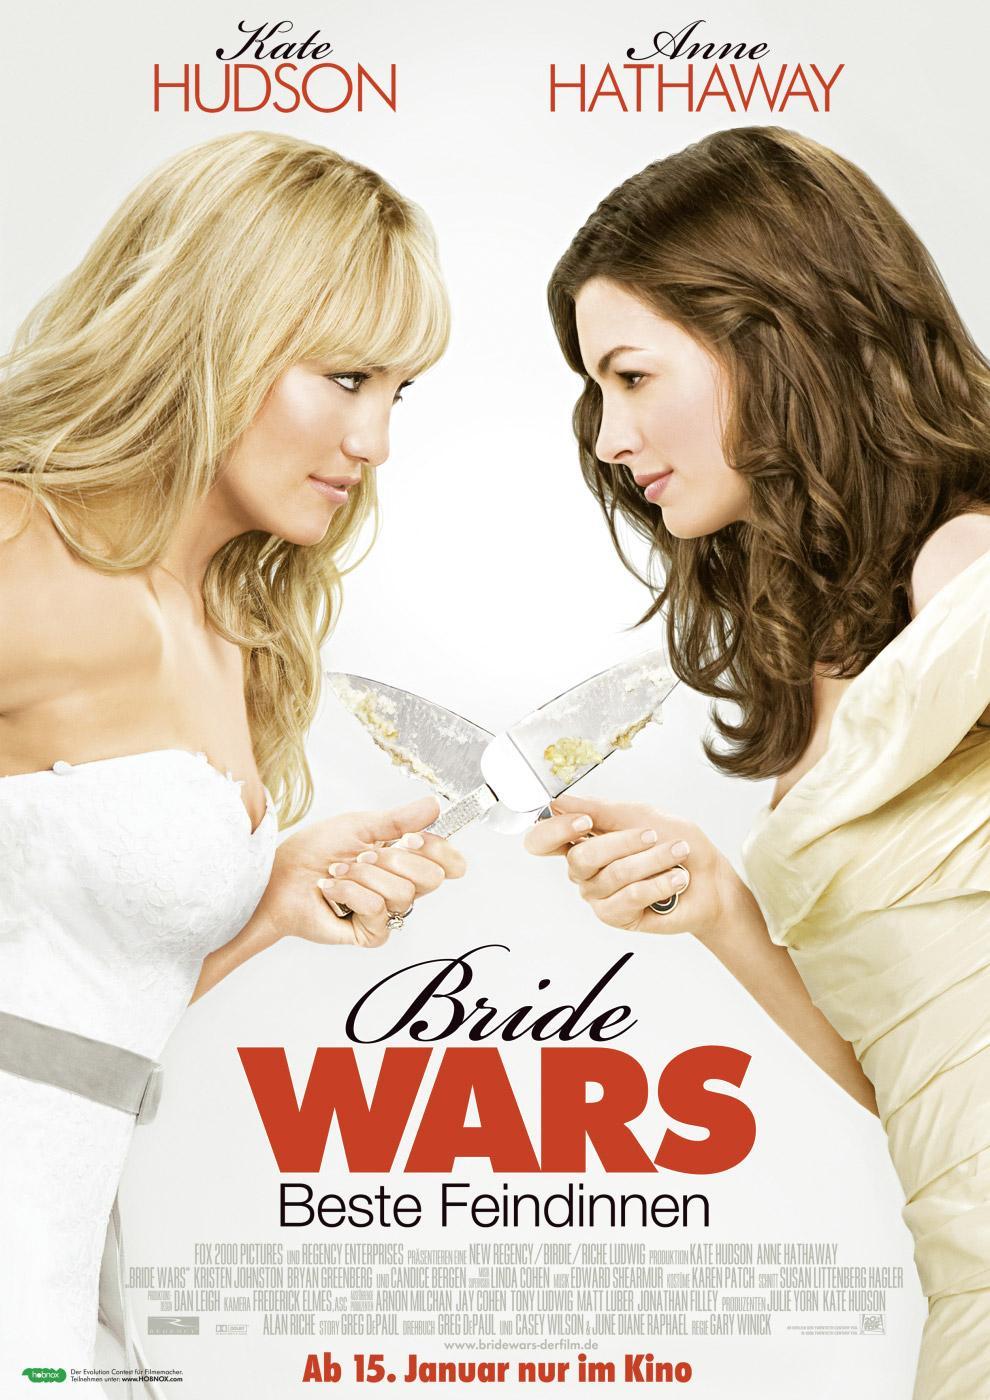 Bride Wars - Beste Feindinnen (Poster)